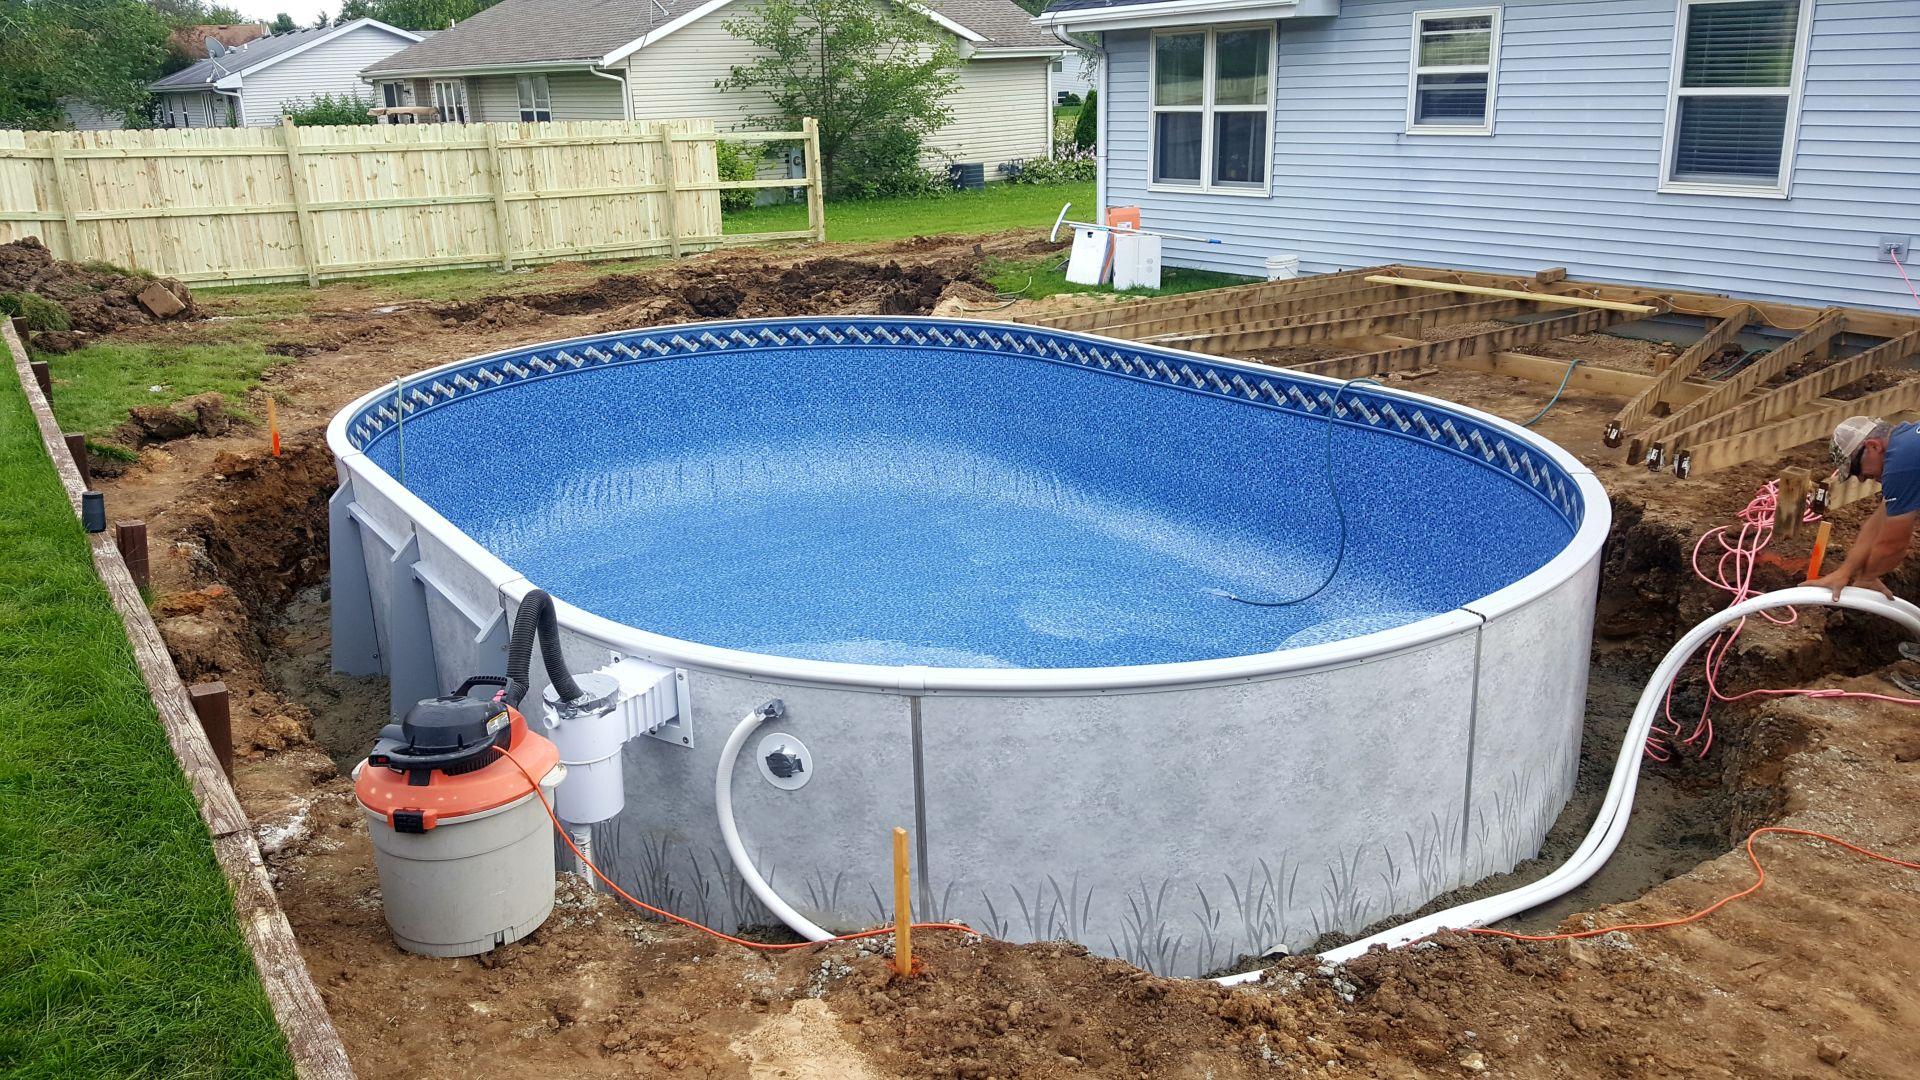 Radiant Pool 16x24 Oval Buried Patio Pleasures